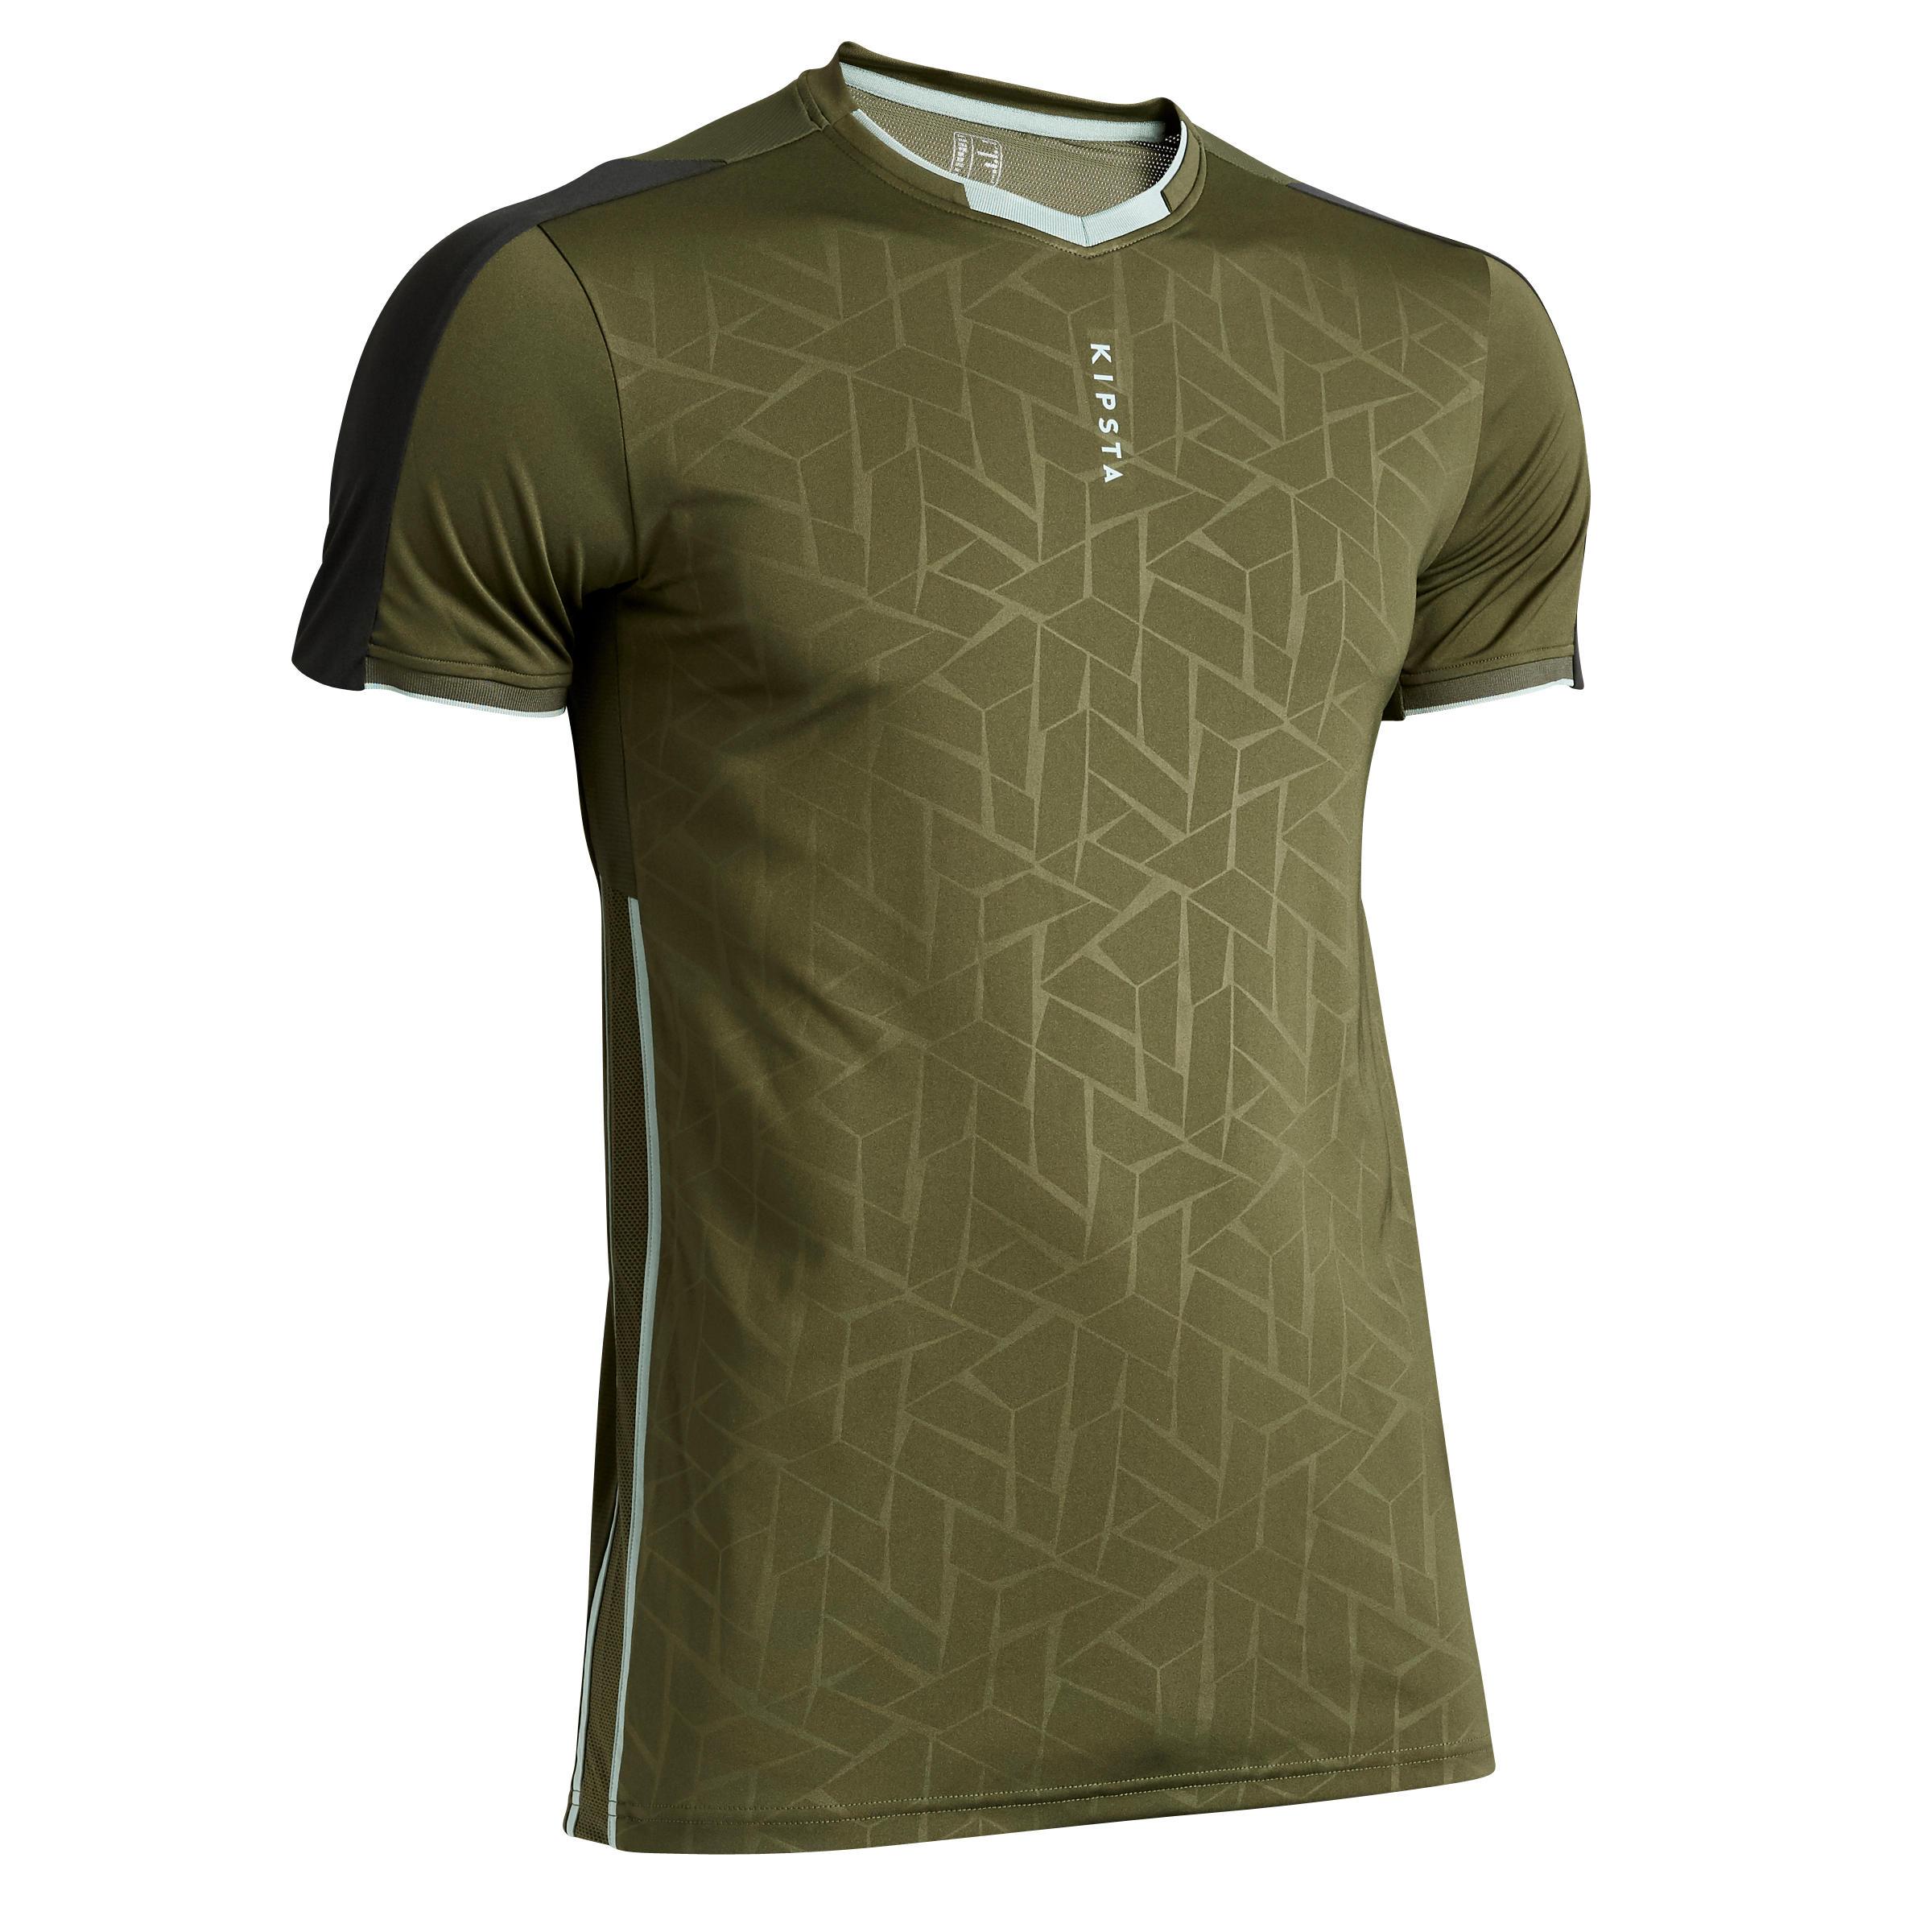 Fußballtrikot F540 Erwachsene khaki   Sportbekleidung > Trikots > Fußballtrikots   Grün - Khaki   Kipsta